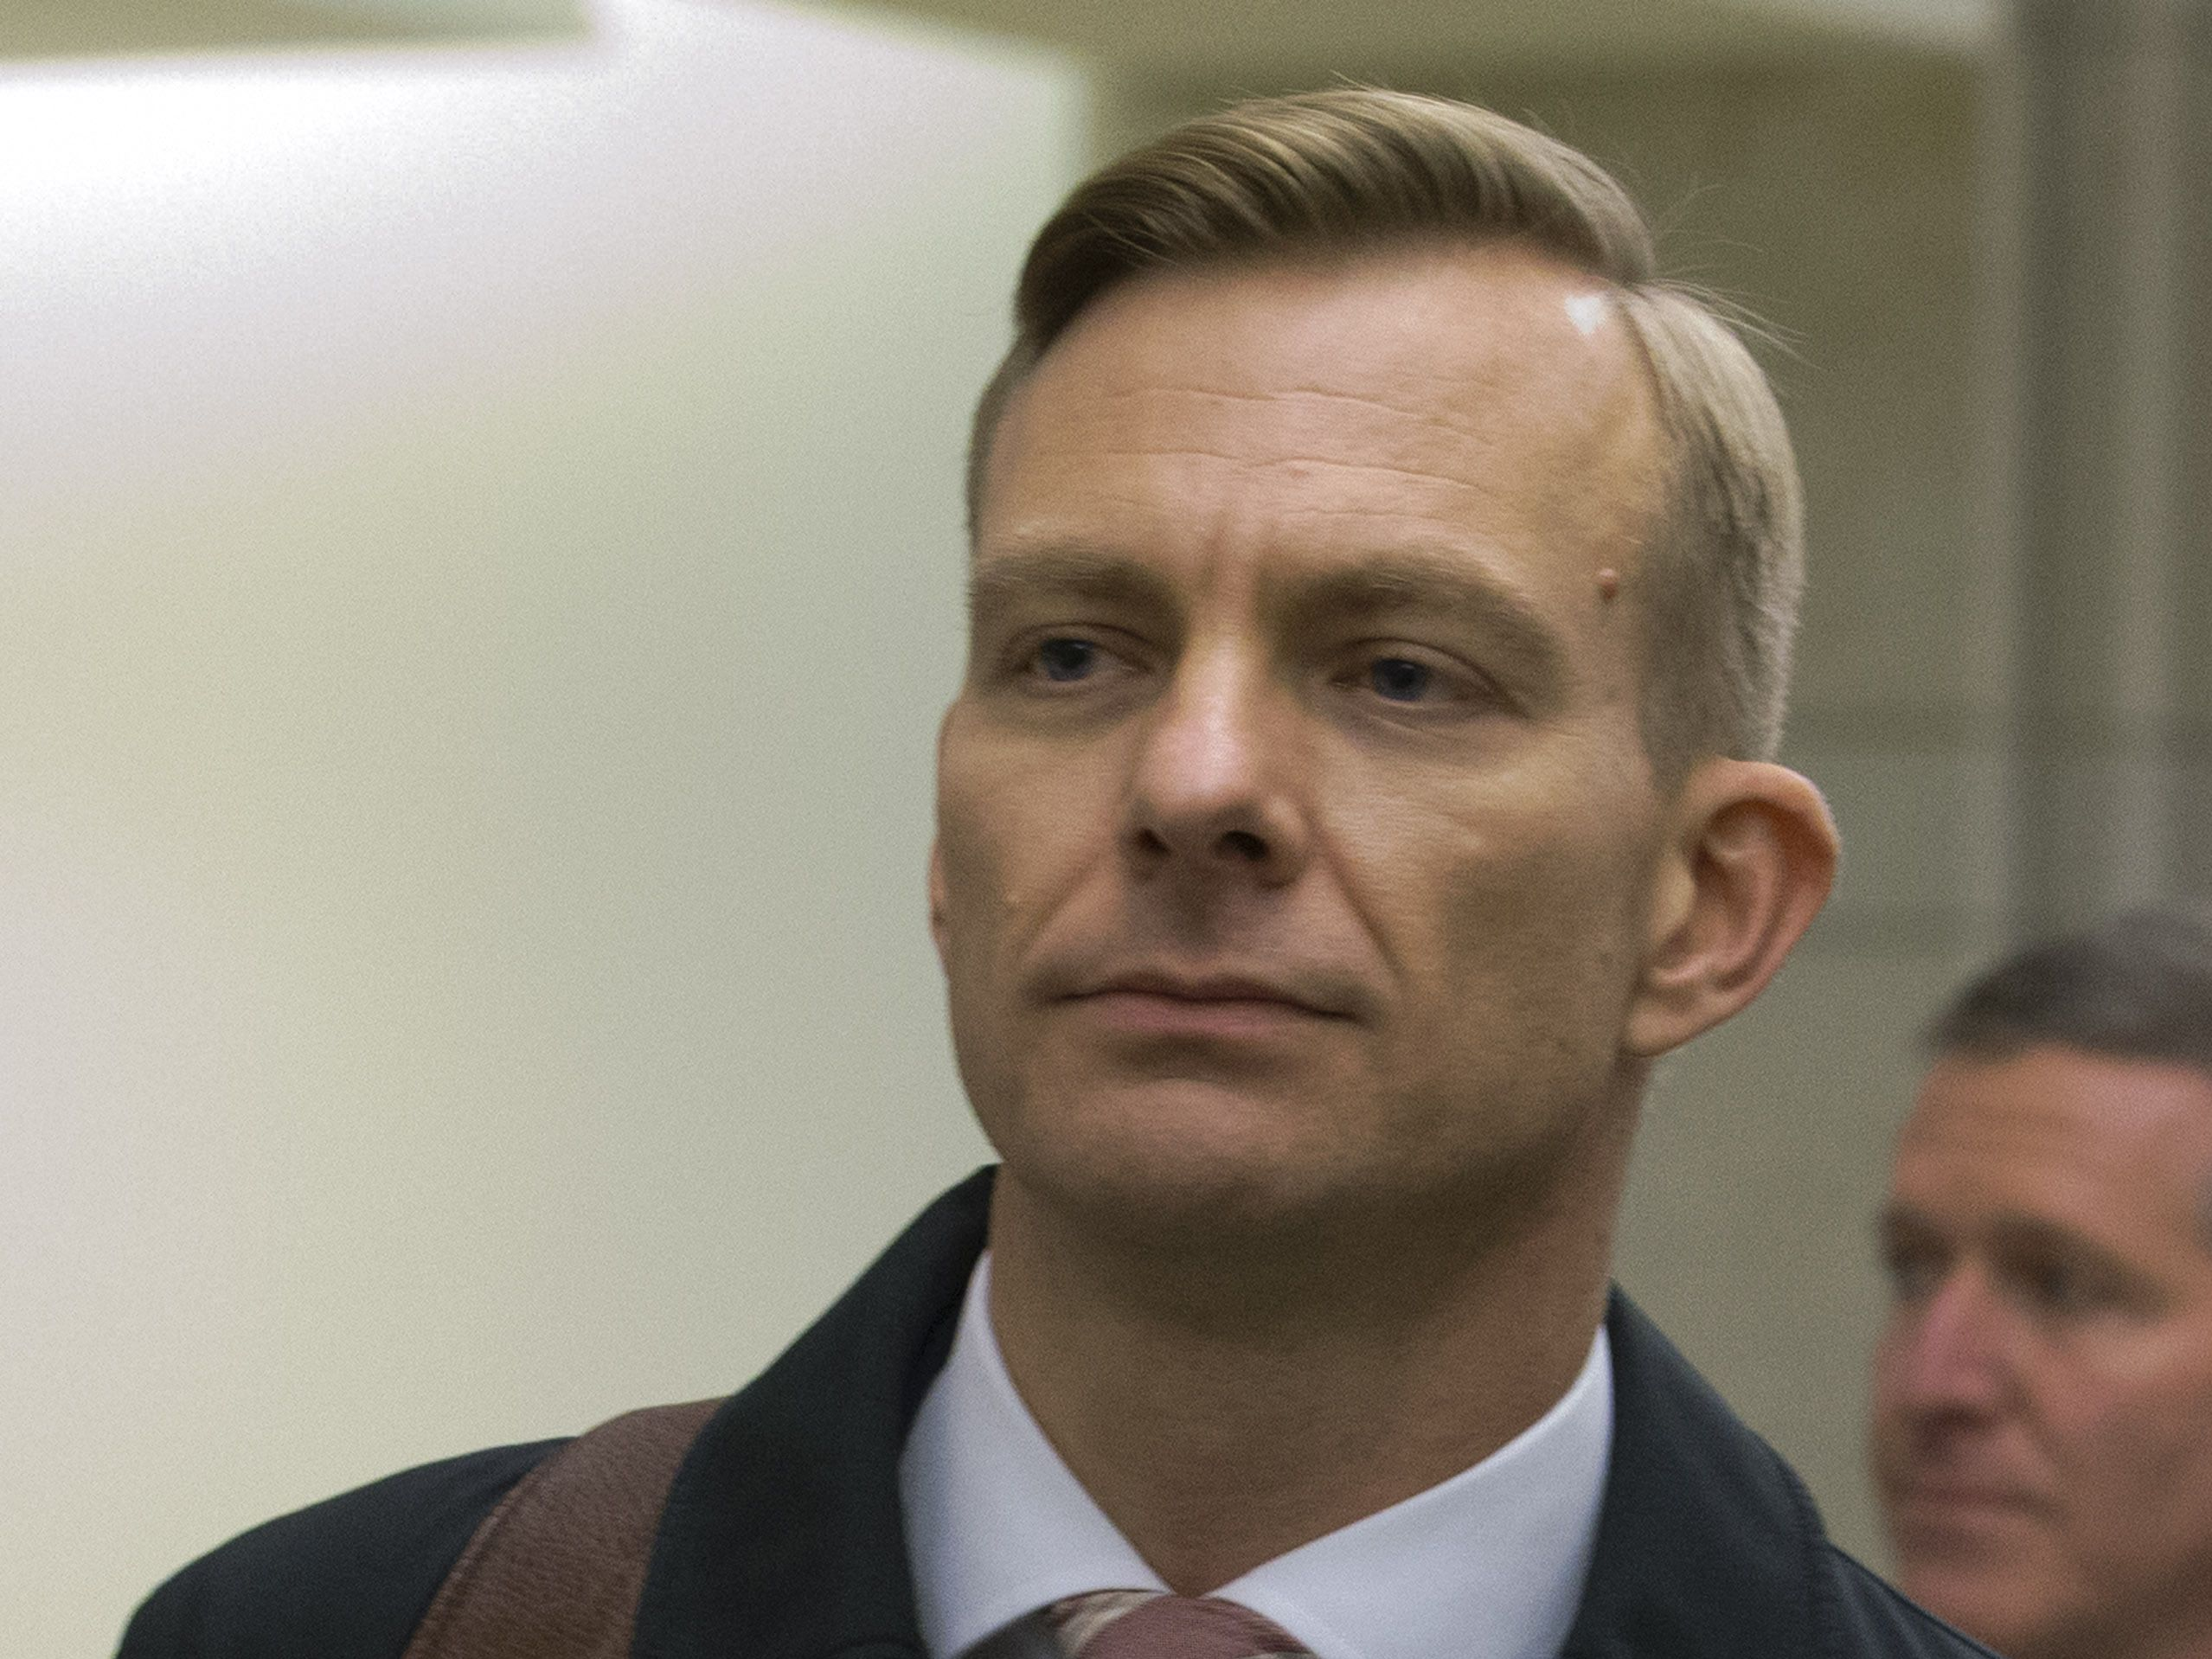 Diplomat says of Trump Ukraine call: 'I remember it vividly'